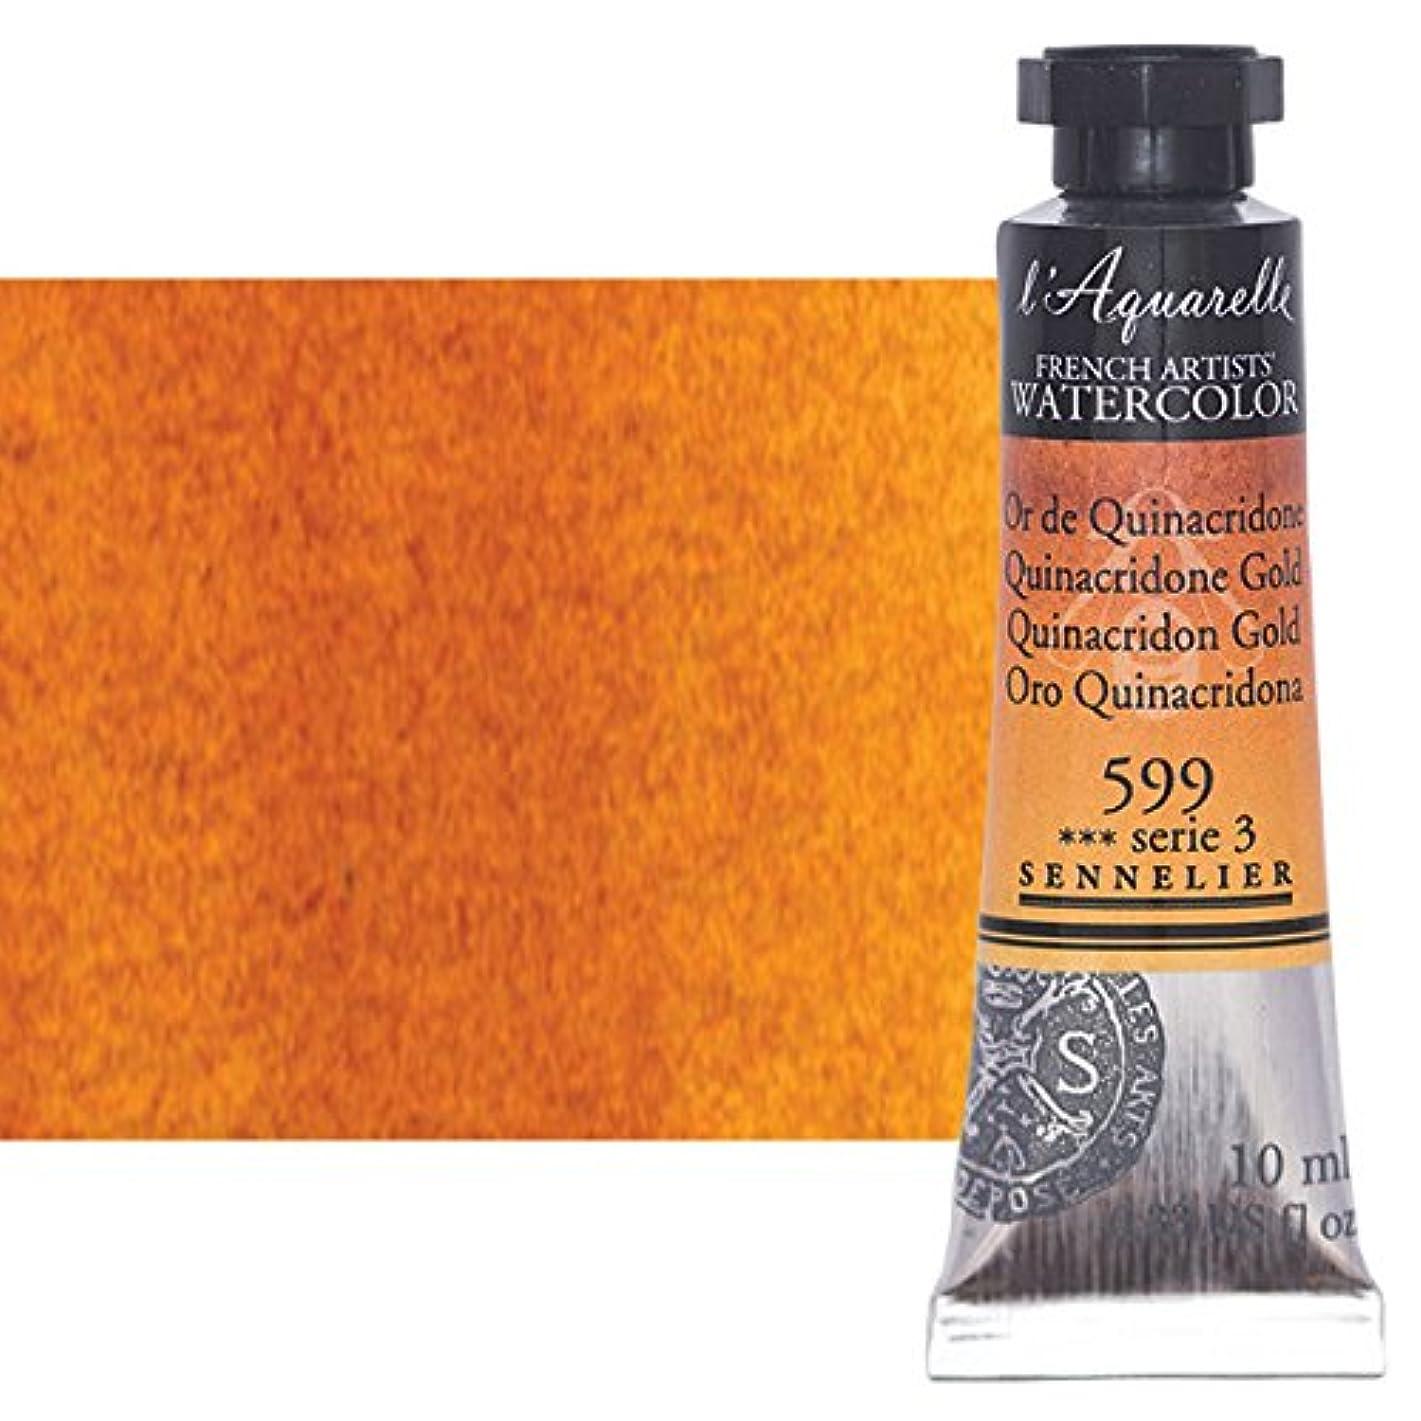 Sennelier l'Aquarelle Watercolor Tubes 10ml - Quinacridone Gold 10ml Tube